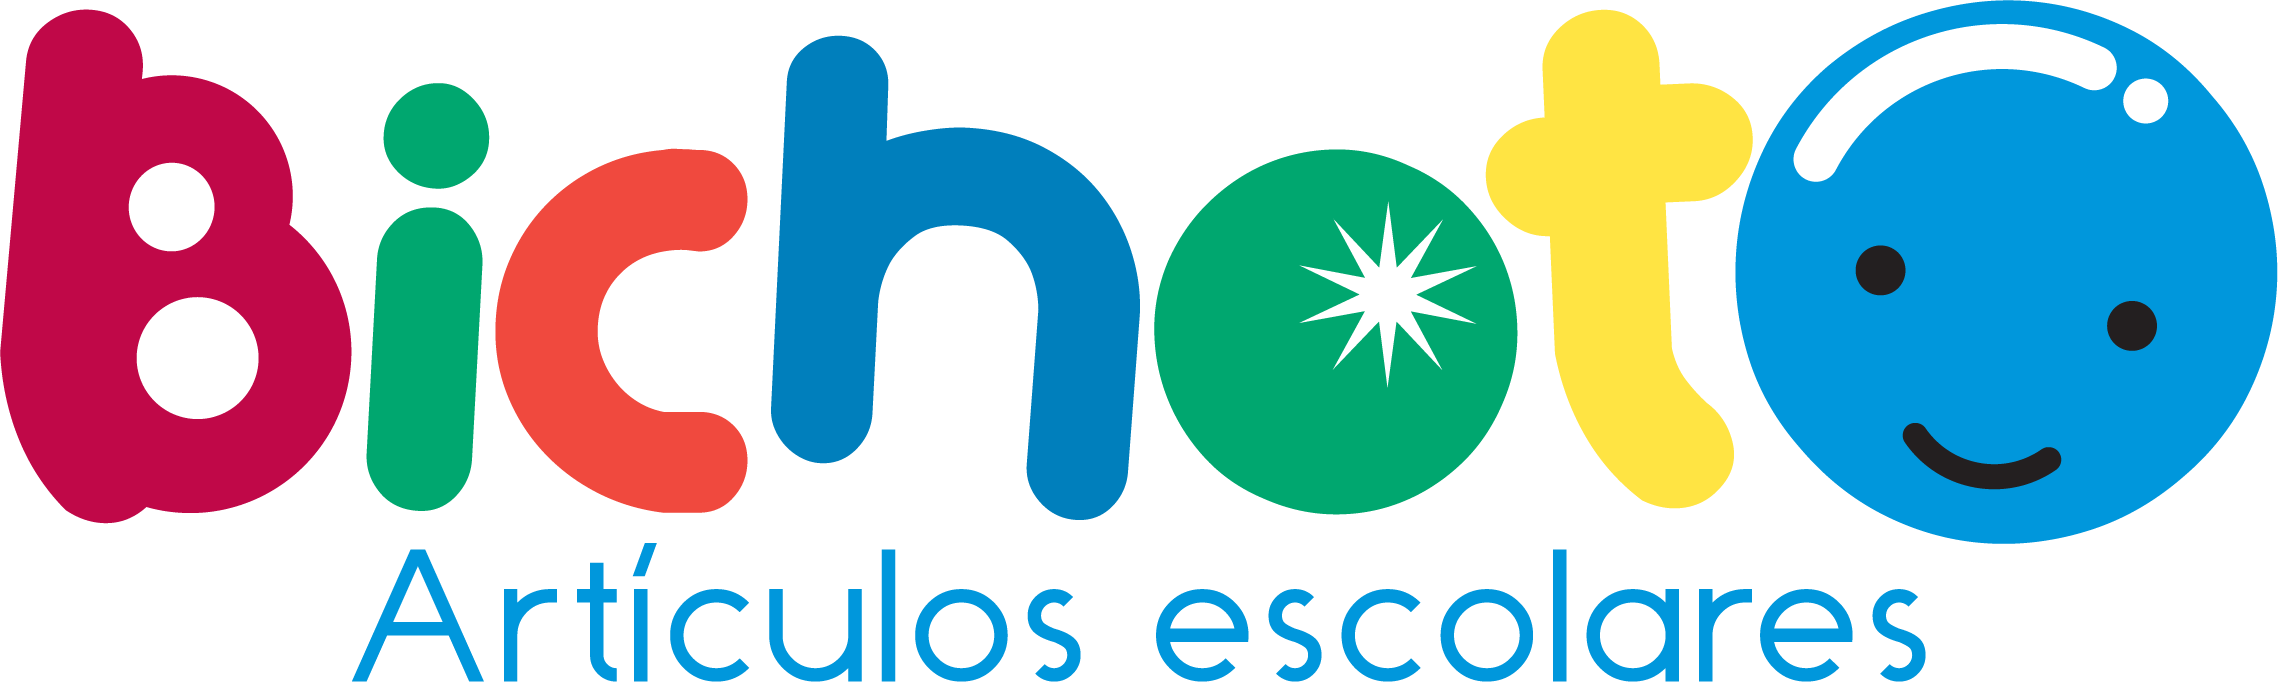 BICHOTO